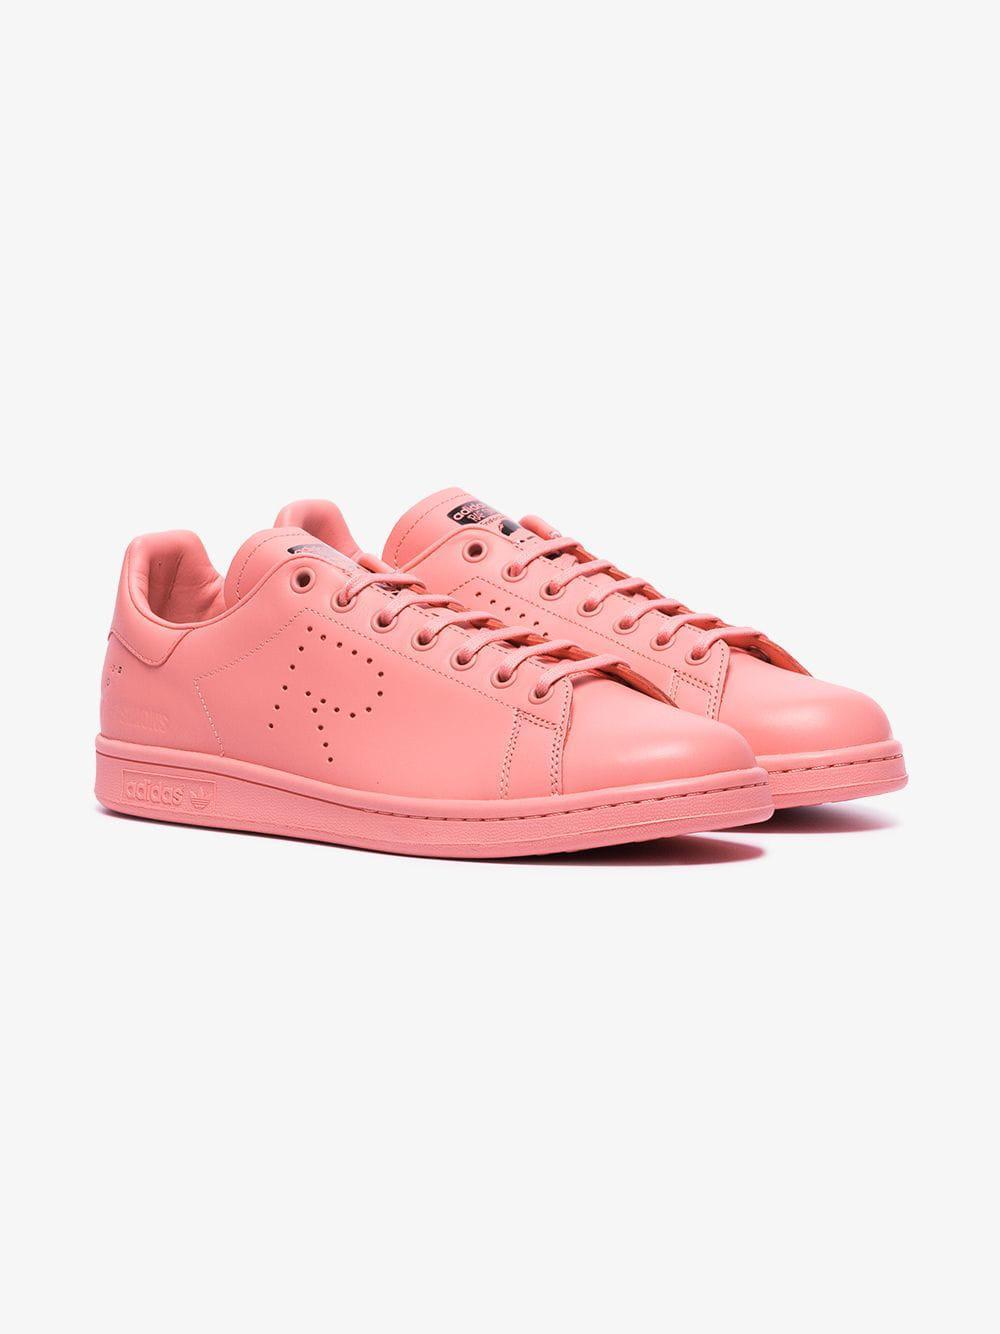 ab266e06cdf Adidas By Raf Simons - Pink X Raf Simons Stan Smith Leather Sneakers for  Men -. View fullscreen